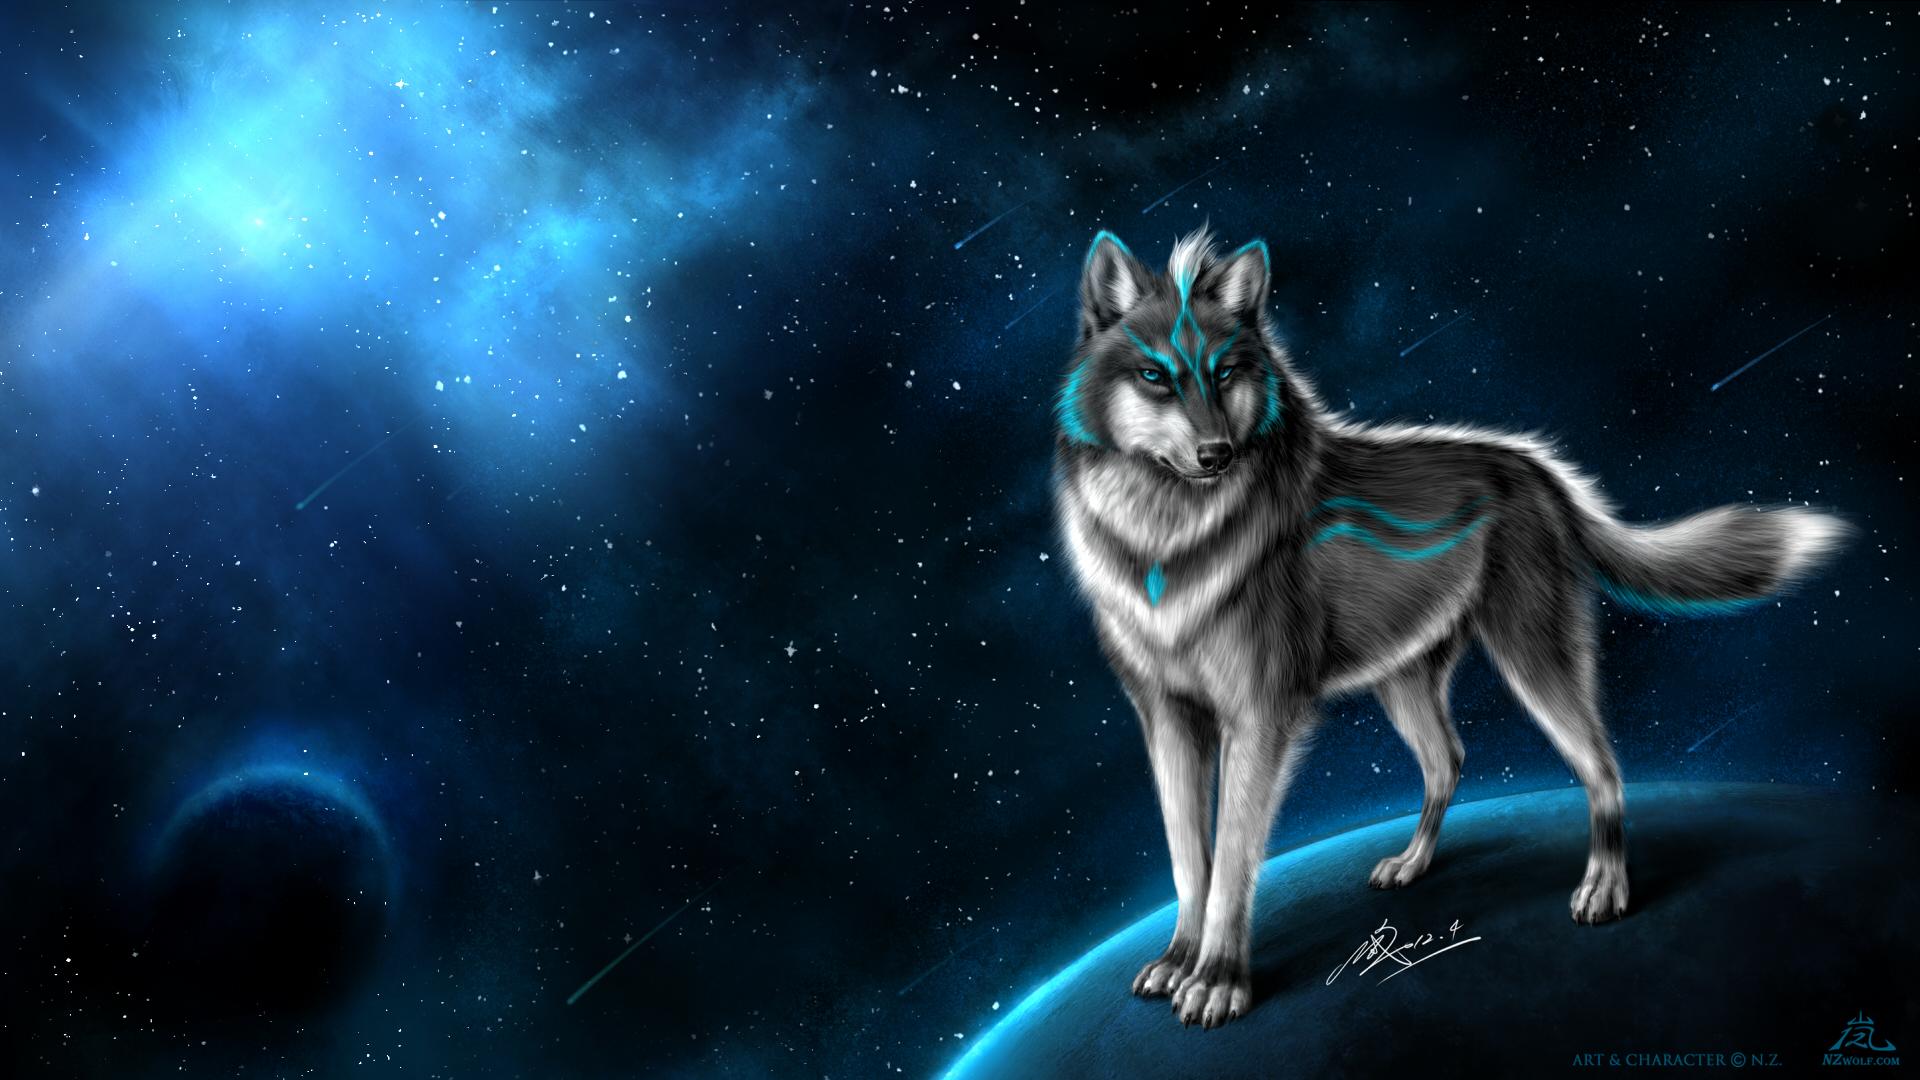 Best Wolf Wallpaper HD For Desktop 1920x1080